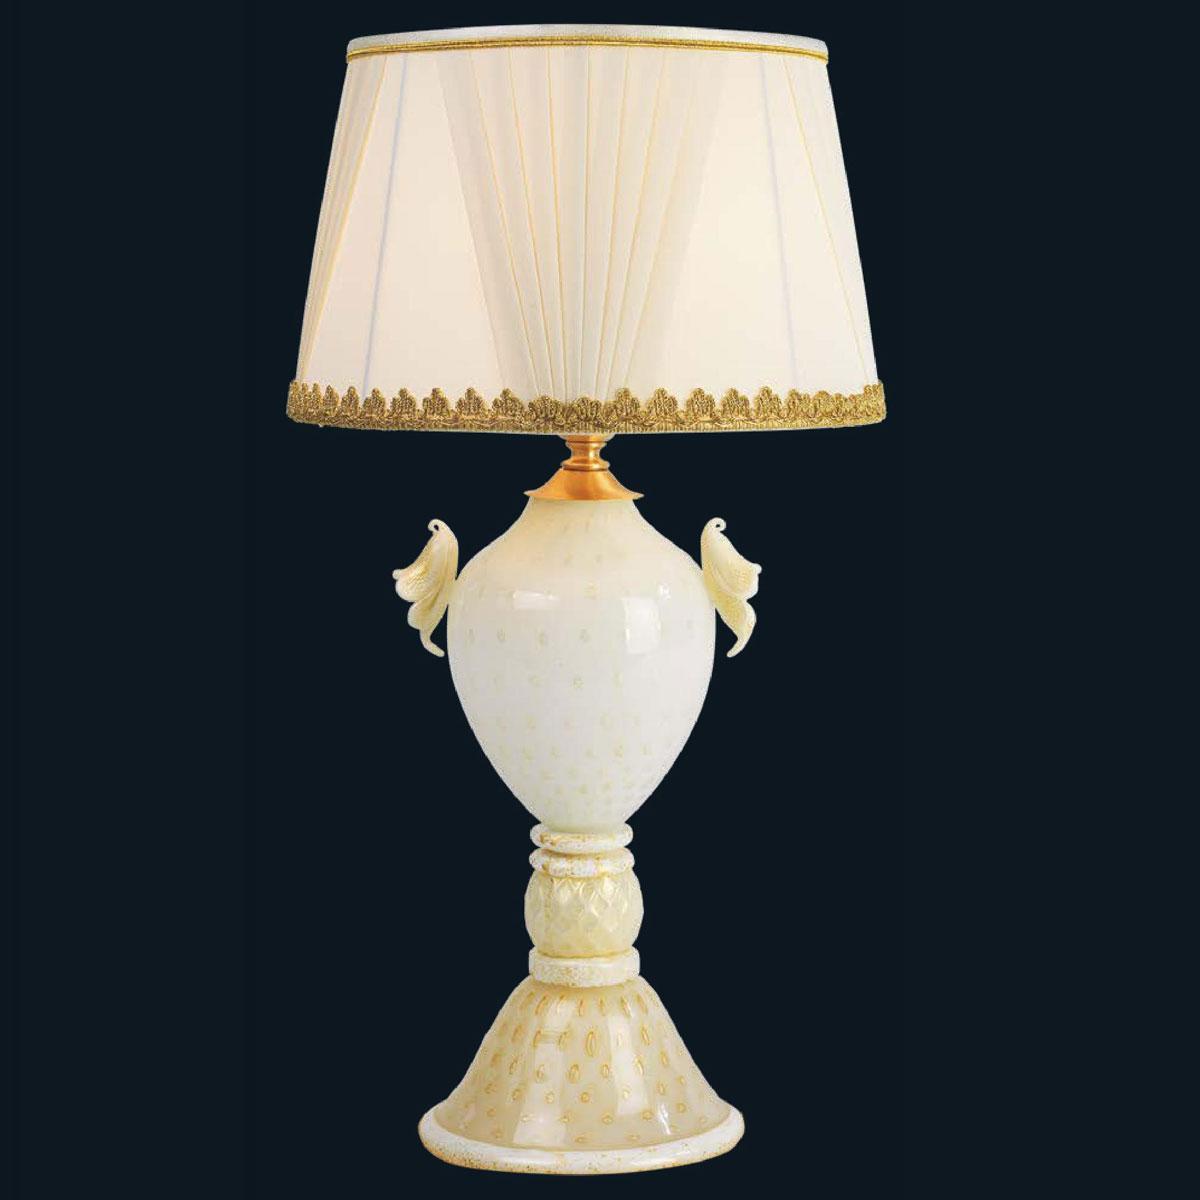 """Kelsie"" Murano glass bedside lamp - 1 light - white and gold"